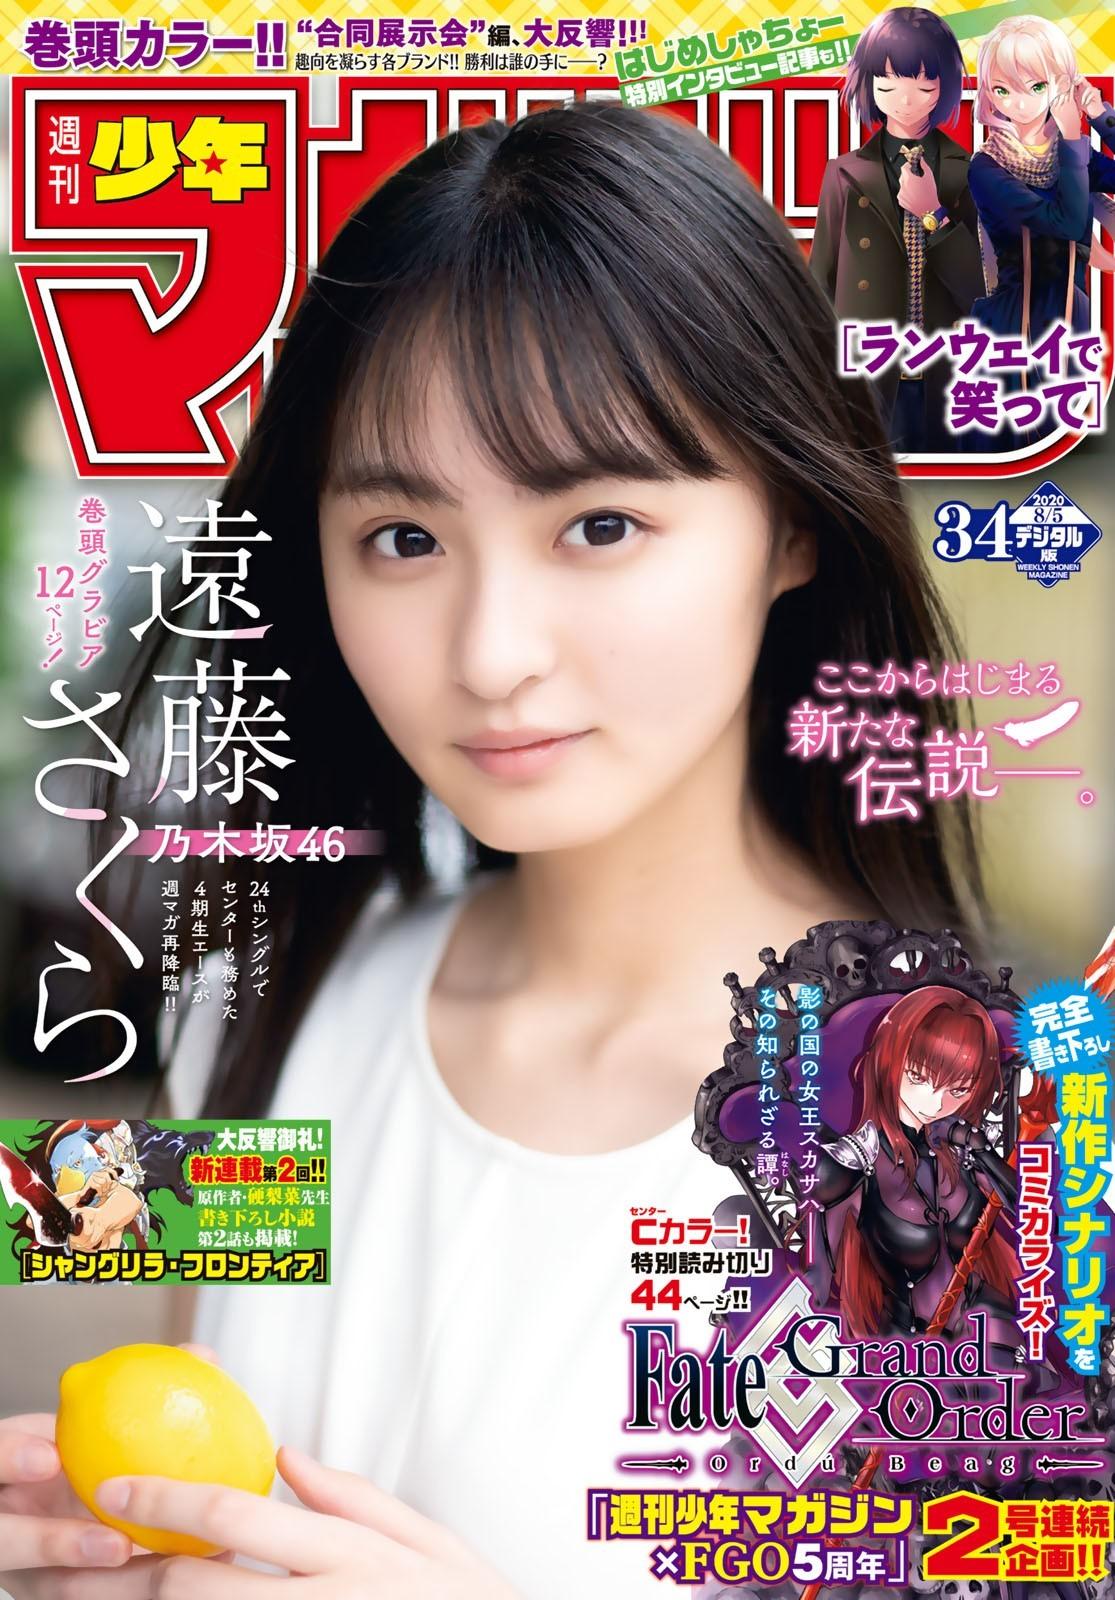 远藤樱 周刊少年Magazine